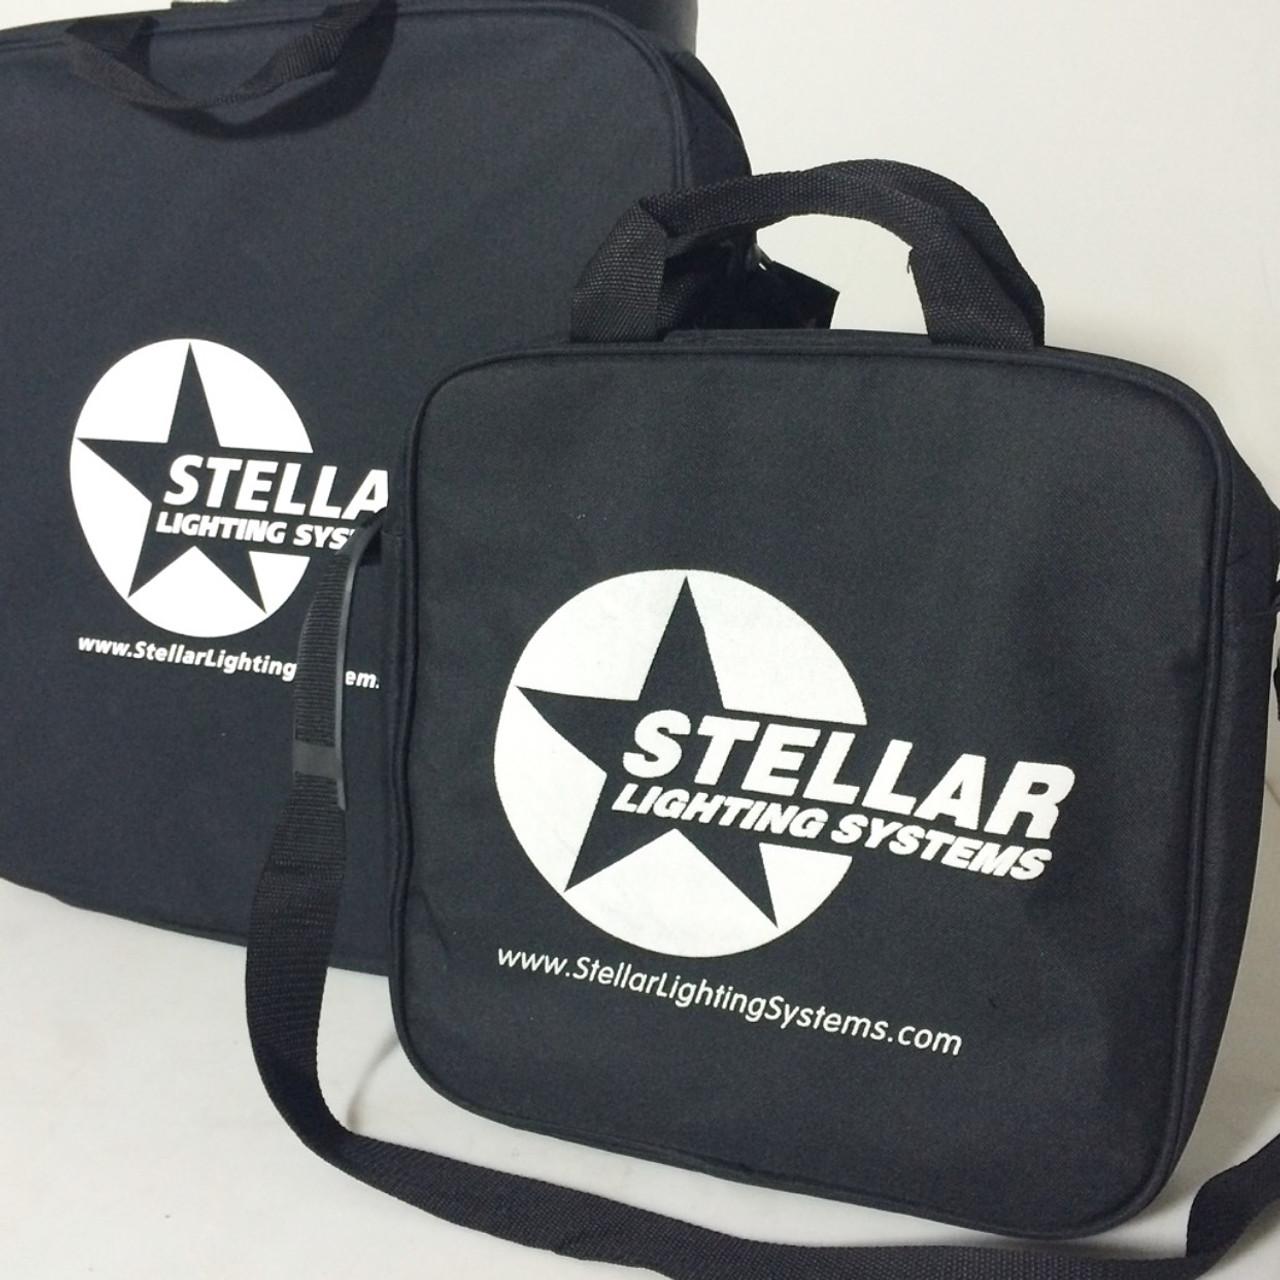 "Stellar Diva 18"" CEL-R18C Ring Light w/ Dimmer + Photo  Stand"